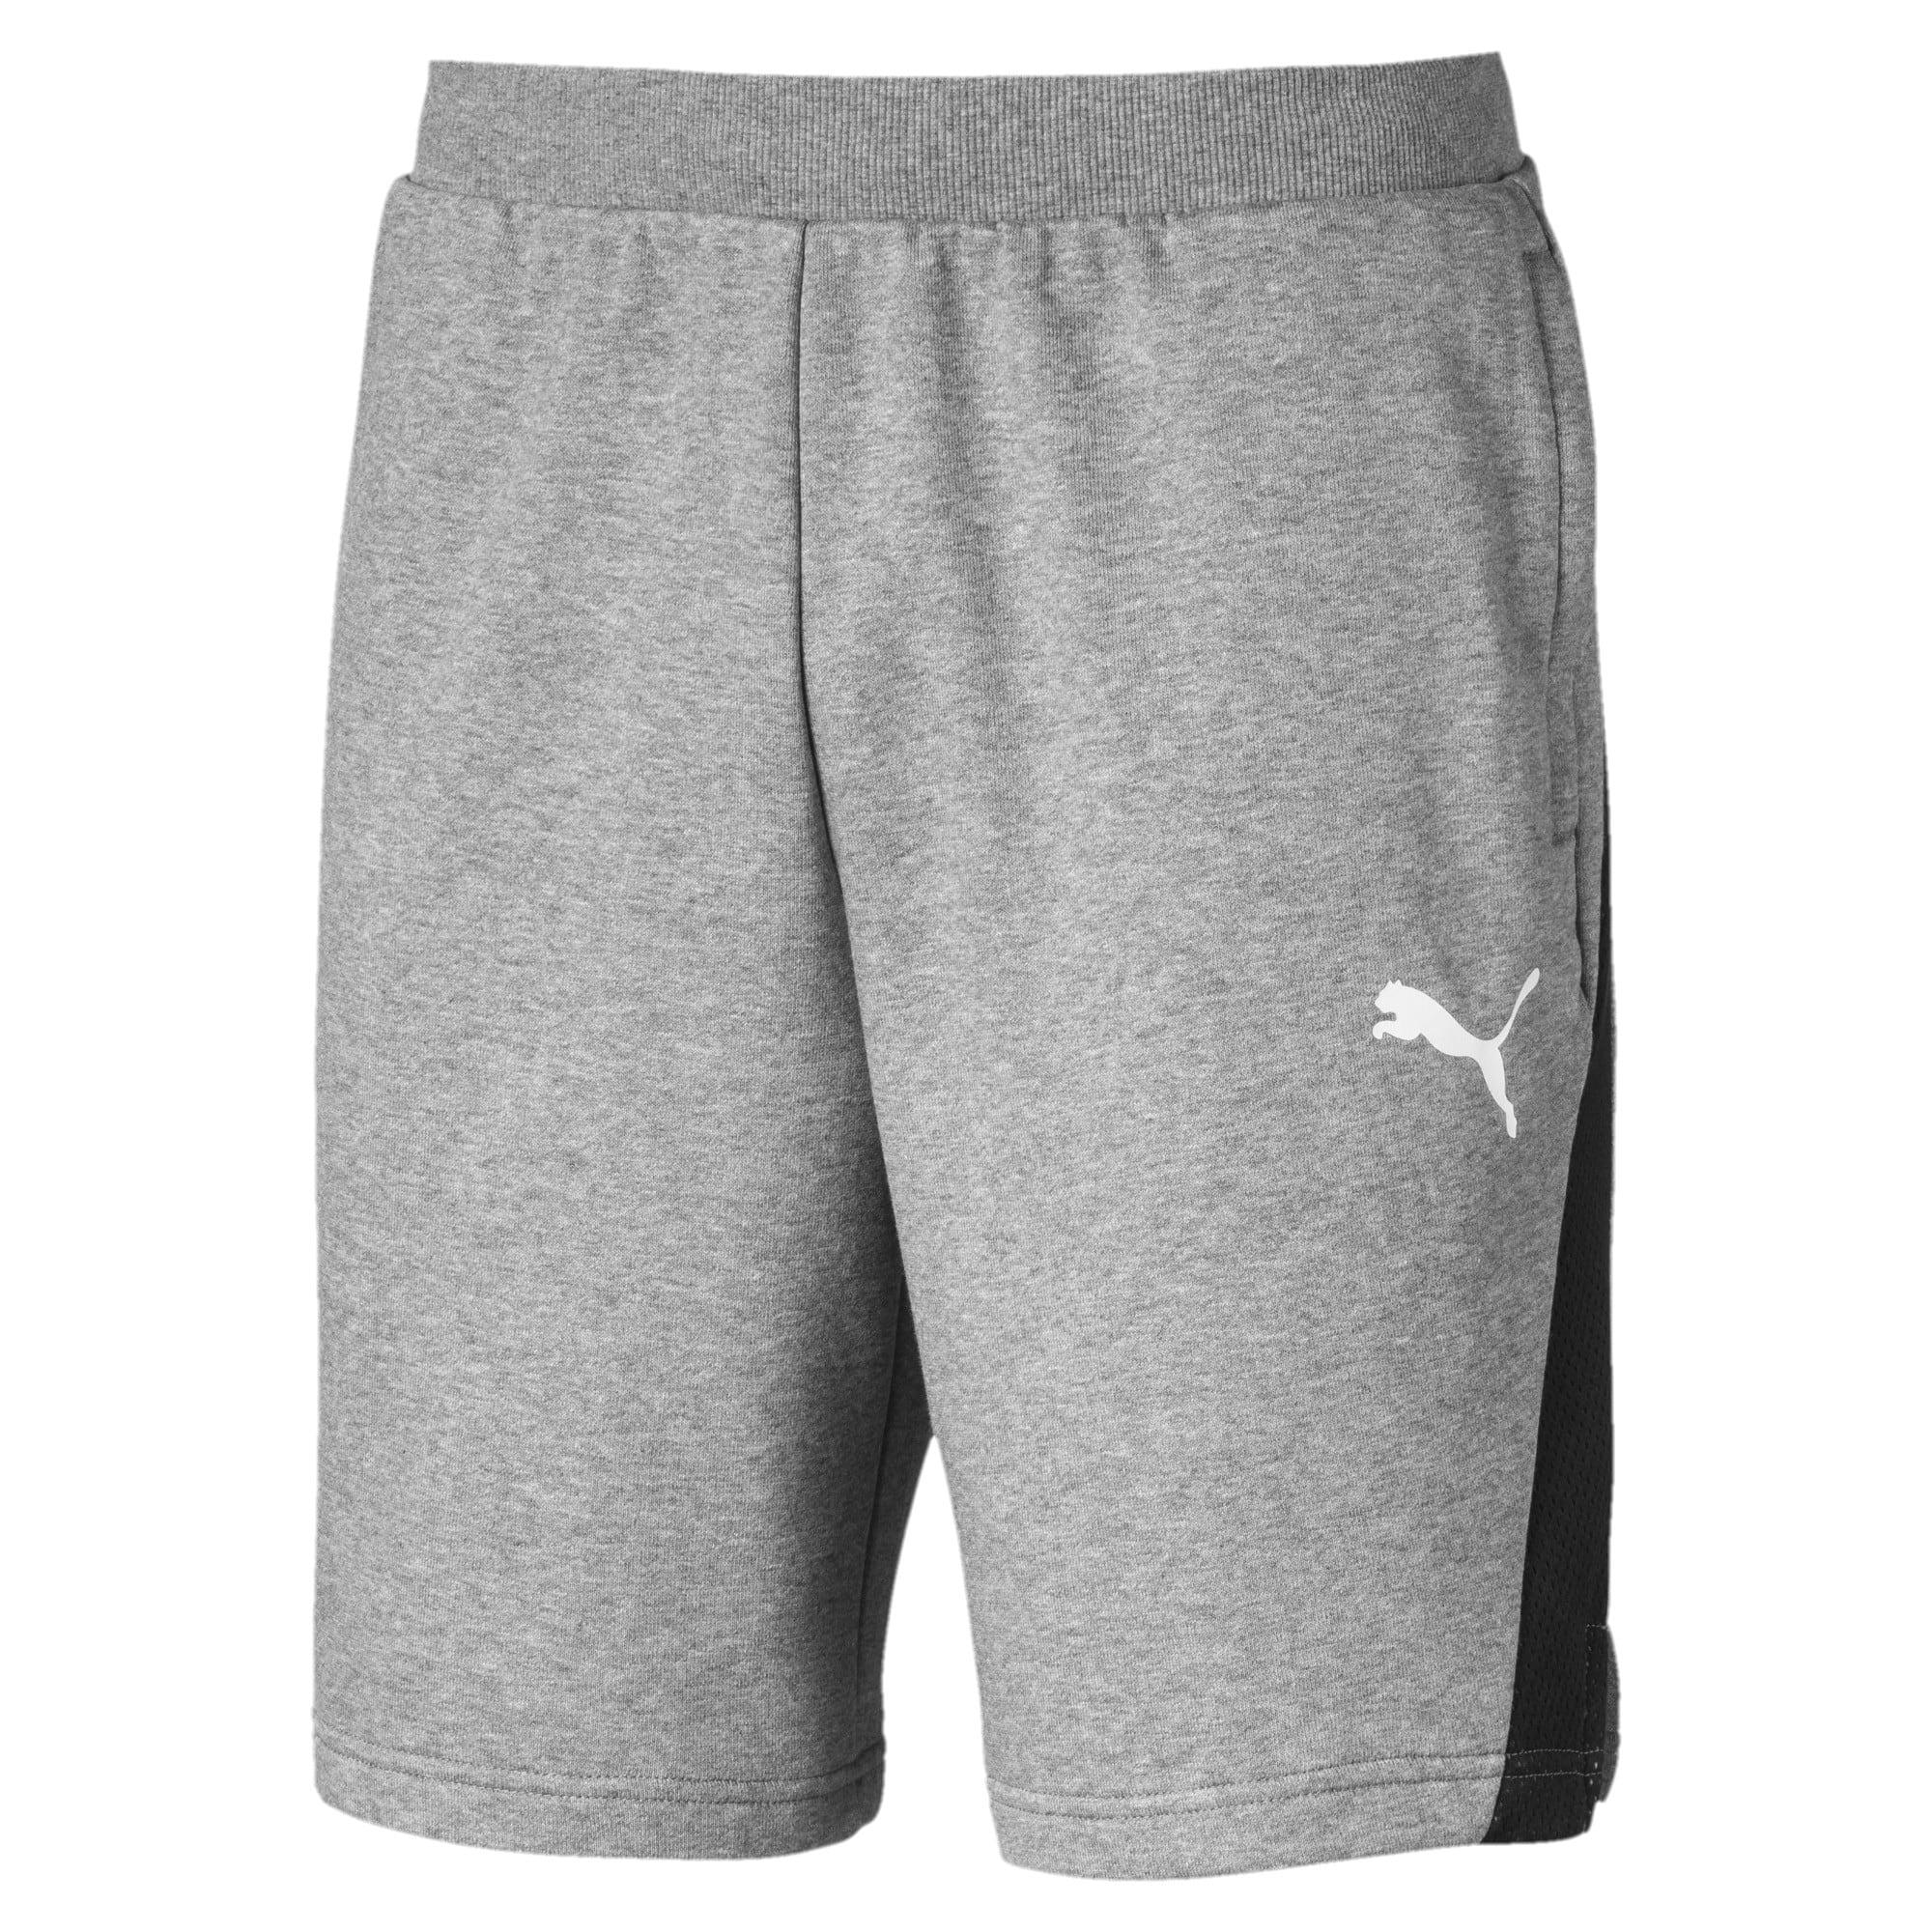 Miniatura 1 de Shorts Modern Sports para hombre, Medium Gray Heather, mediano